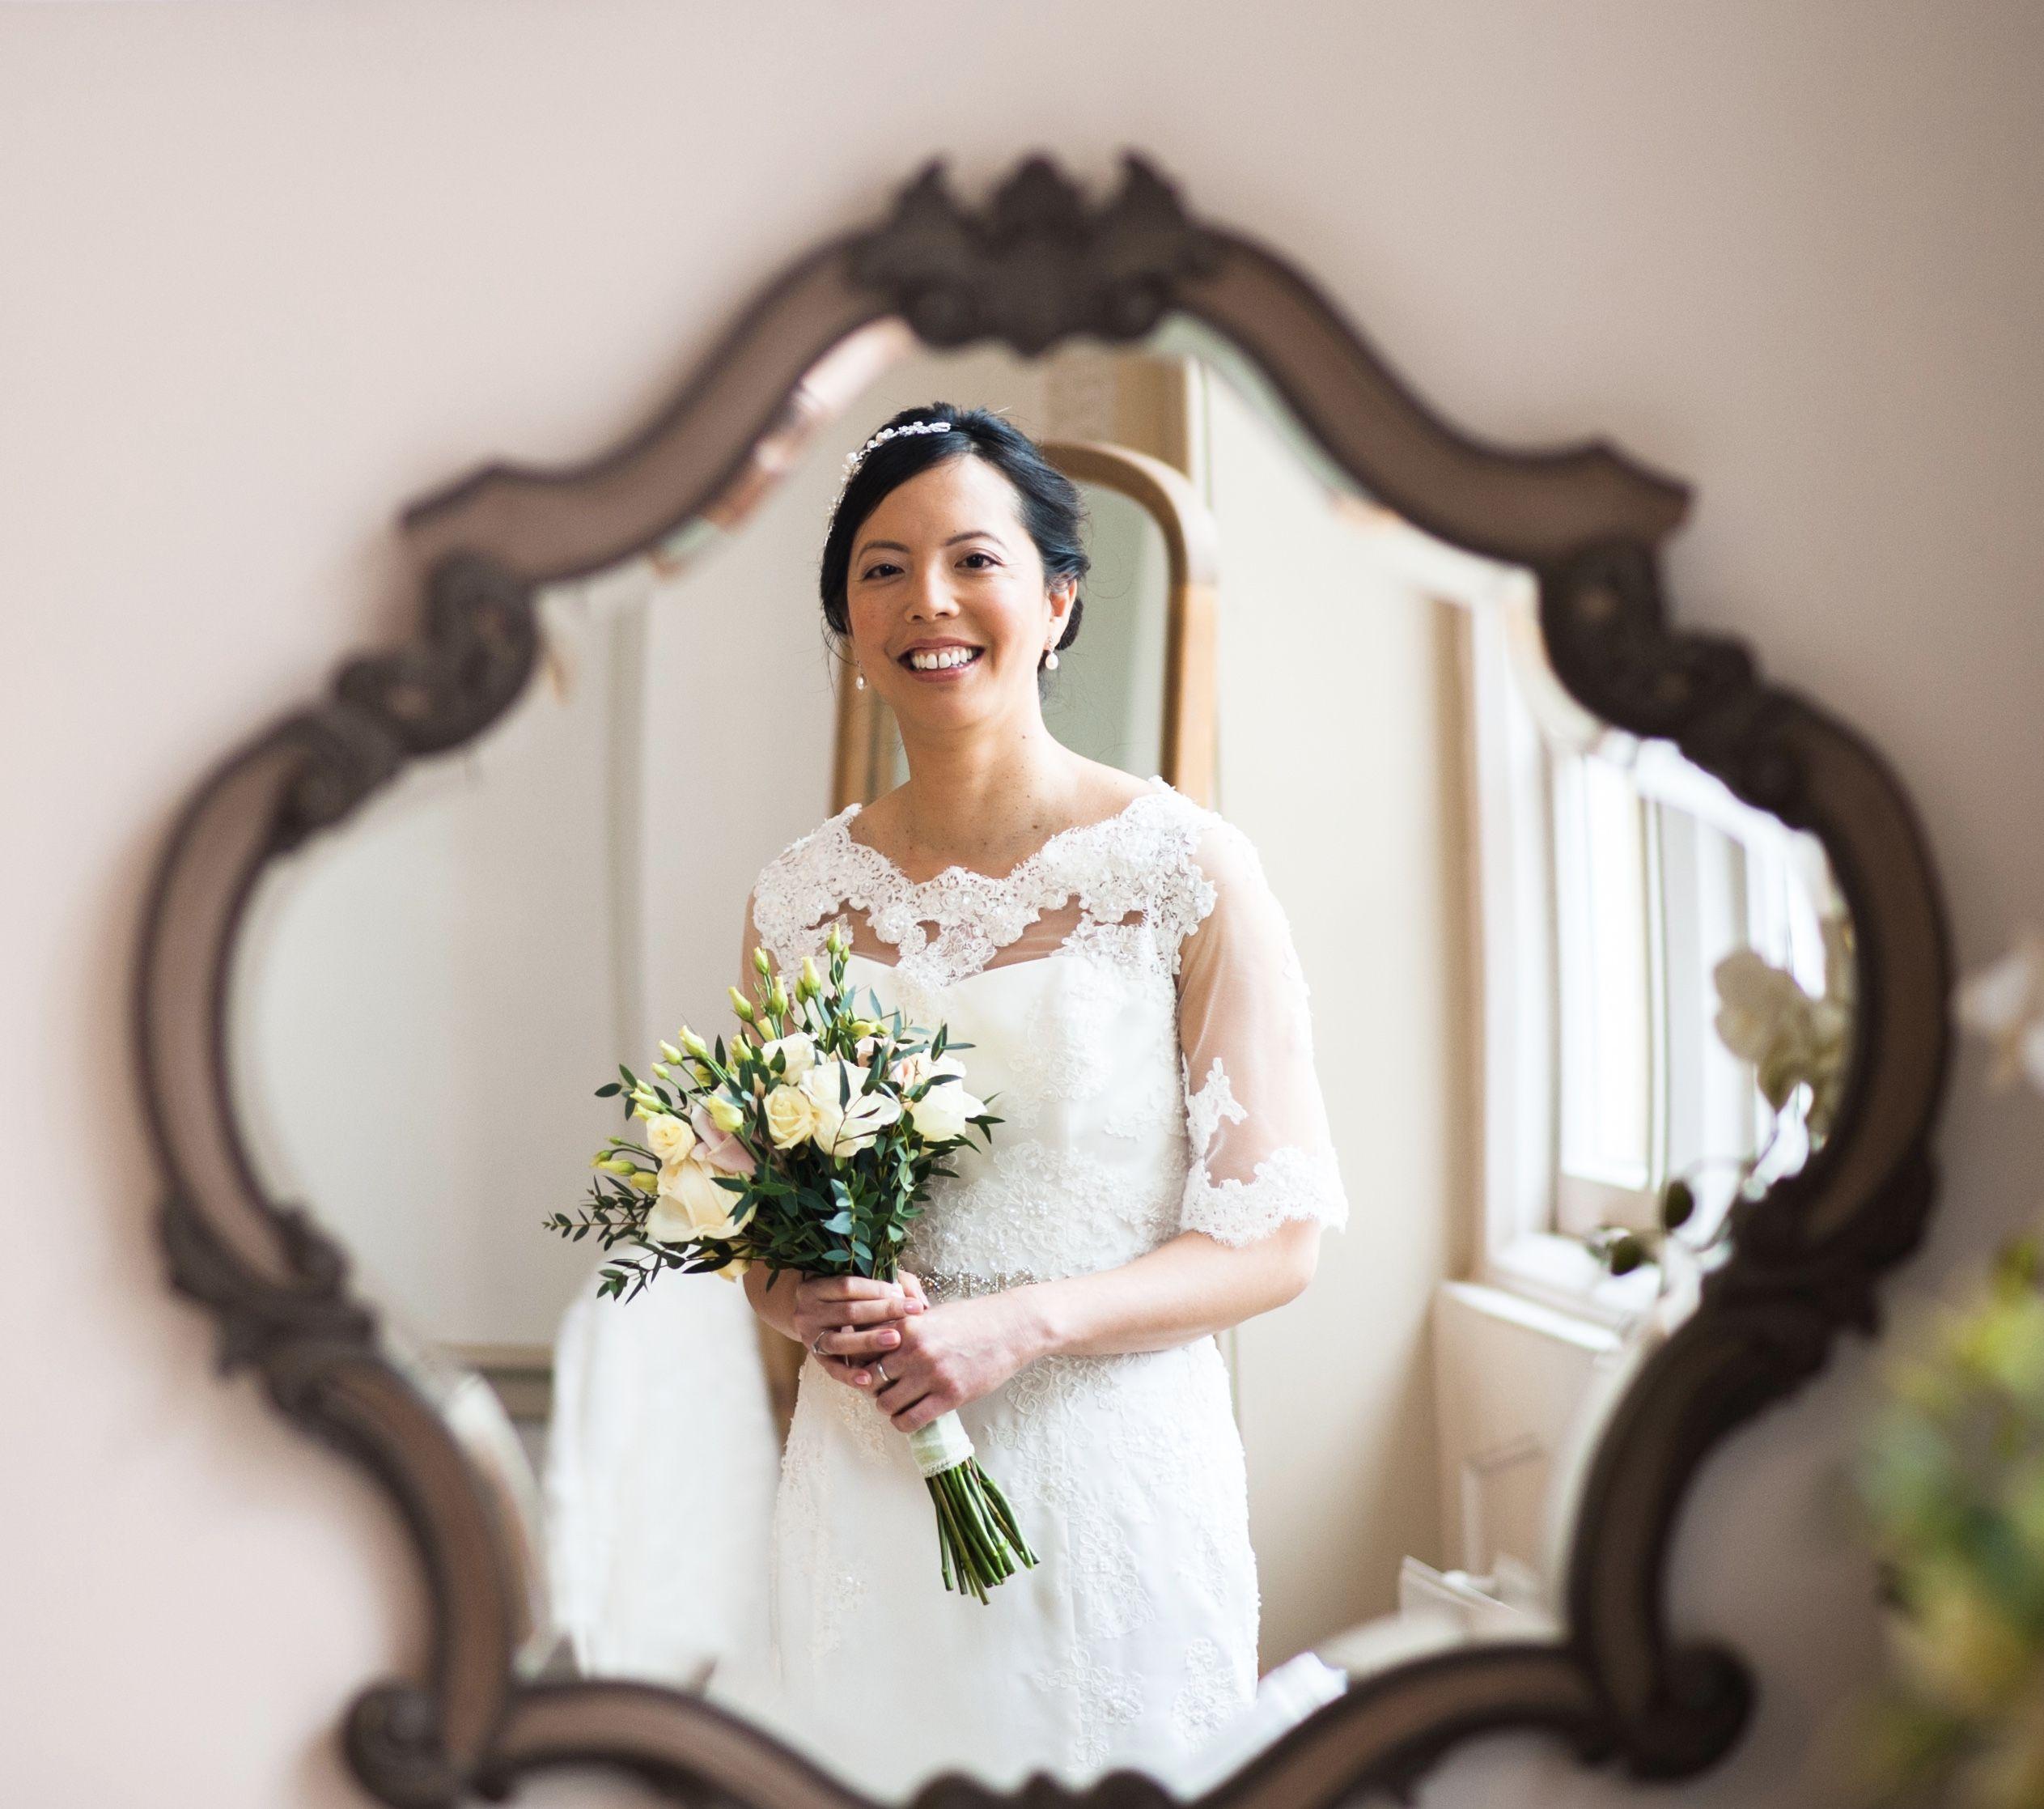 Enzoani Gavle £595 #preloved #prelovedweddingdress #bride #bridetobe ...